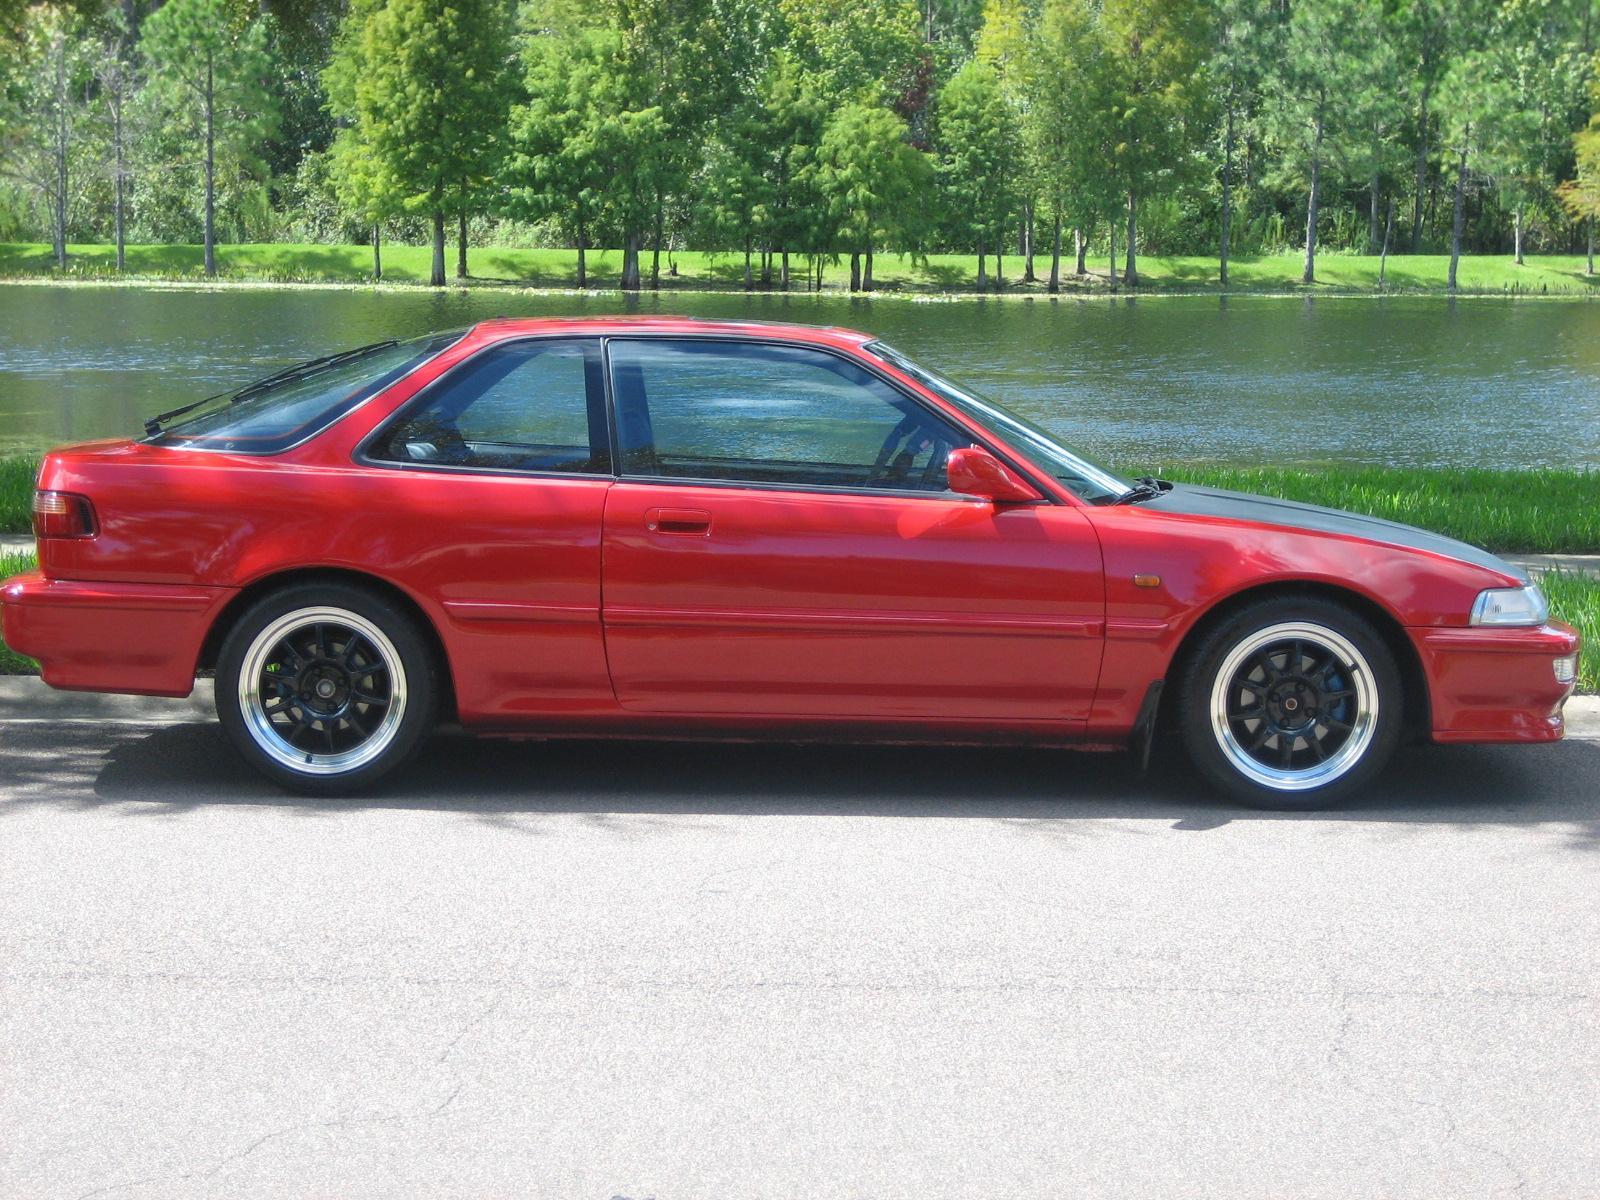 92 Acura Integra GS-R (orlando, FL) Mint | HondaSwap